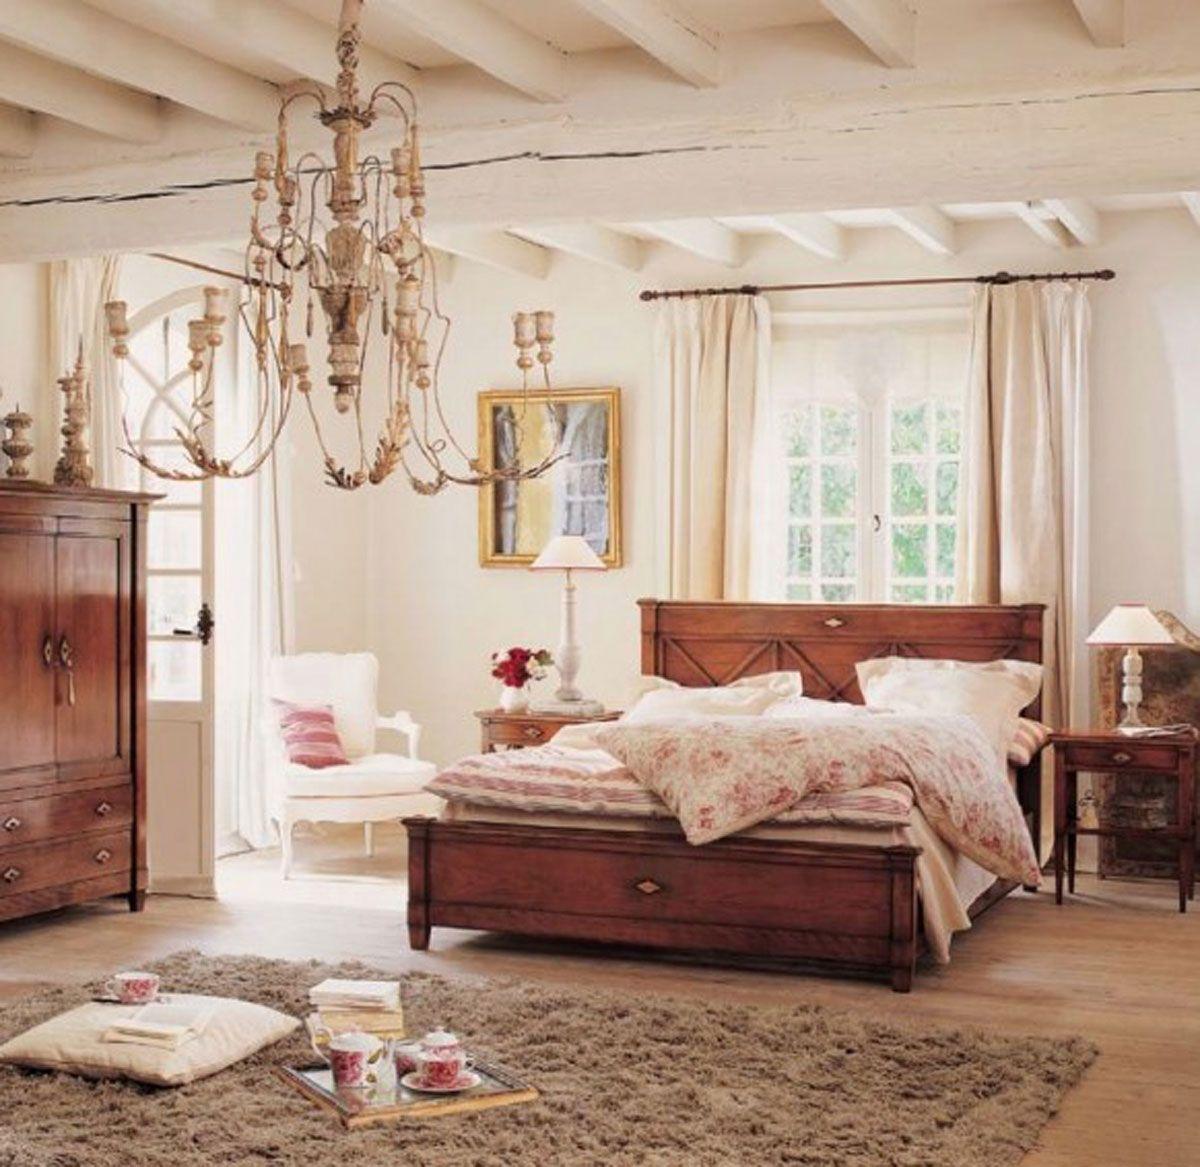 rustic wooden furniture sets in cozy vintage teenage bedroom ideas